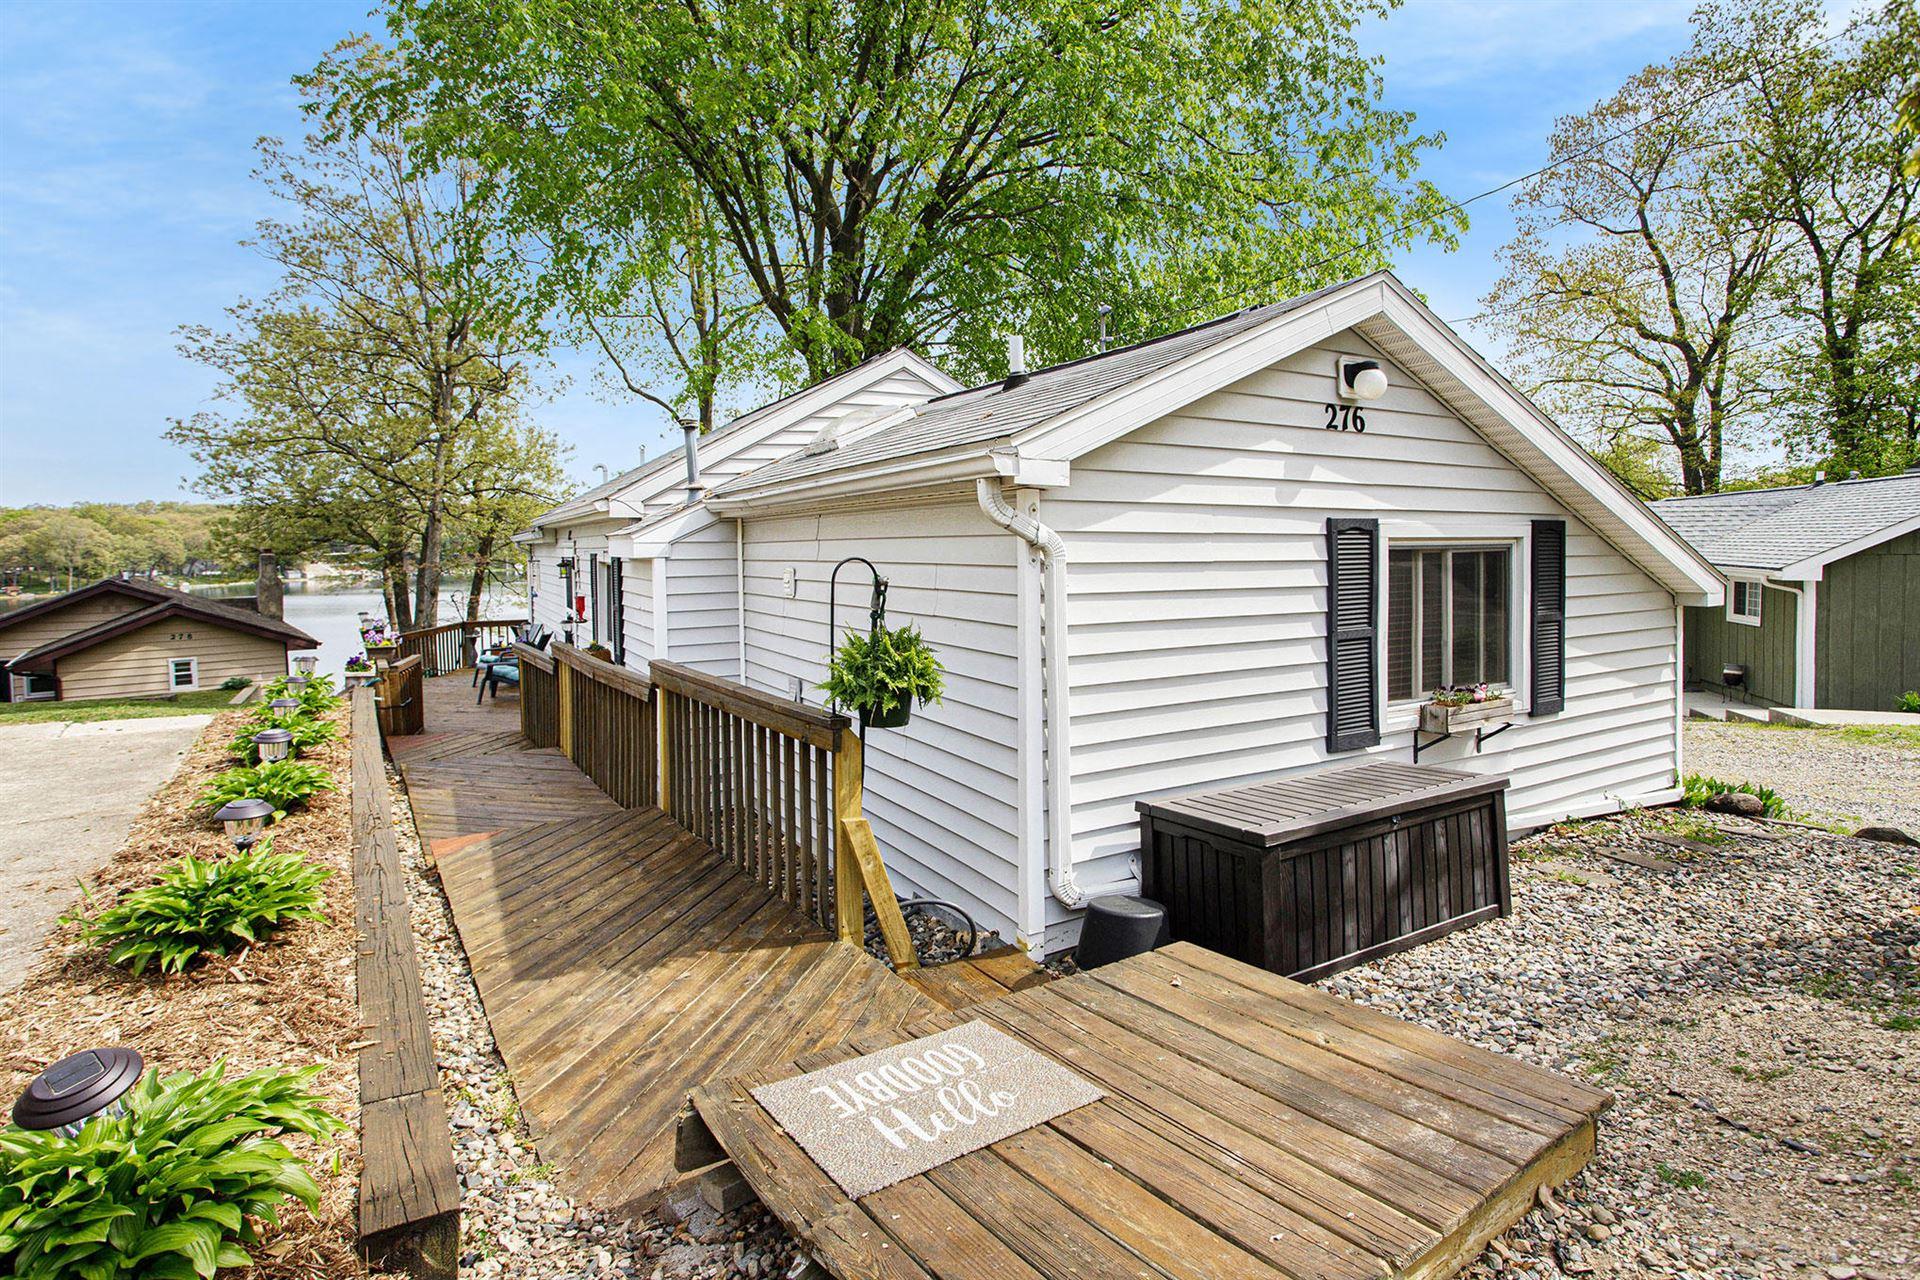 276 Carpenter Drive, Battle Creek, MI 49017 - MLS#: 21018534